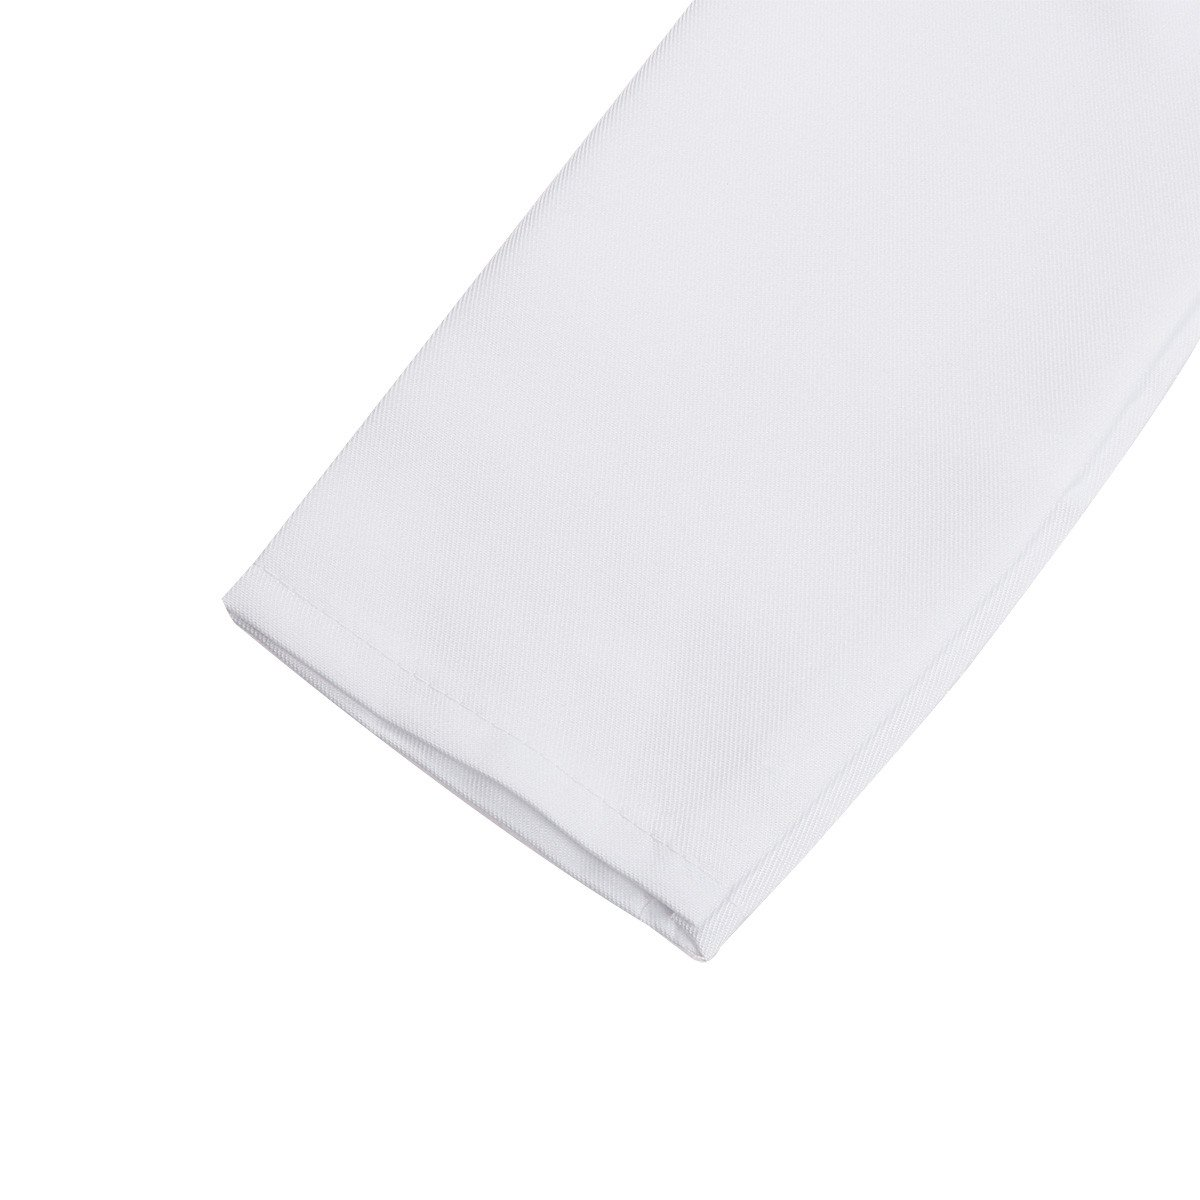 Freebily Scrubs Childrens Lab Coat-Soft Fabric Long Sleeve Doctor Uniform White Cosplay Dress up Costume White 4-5 by Freebily (Image #4)